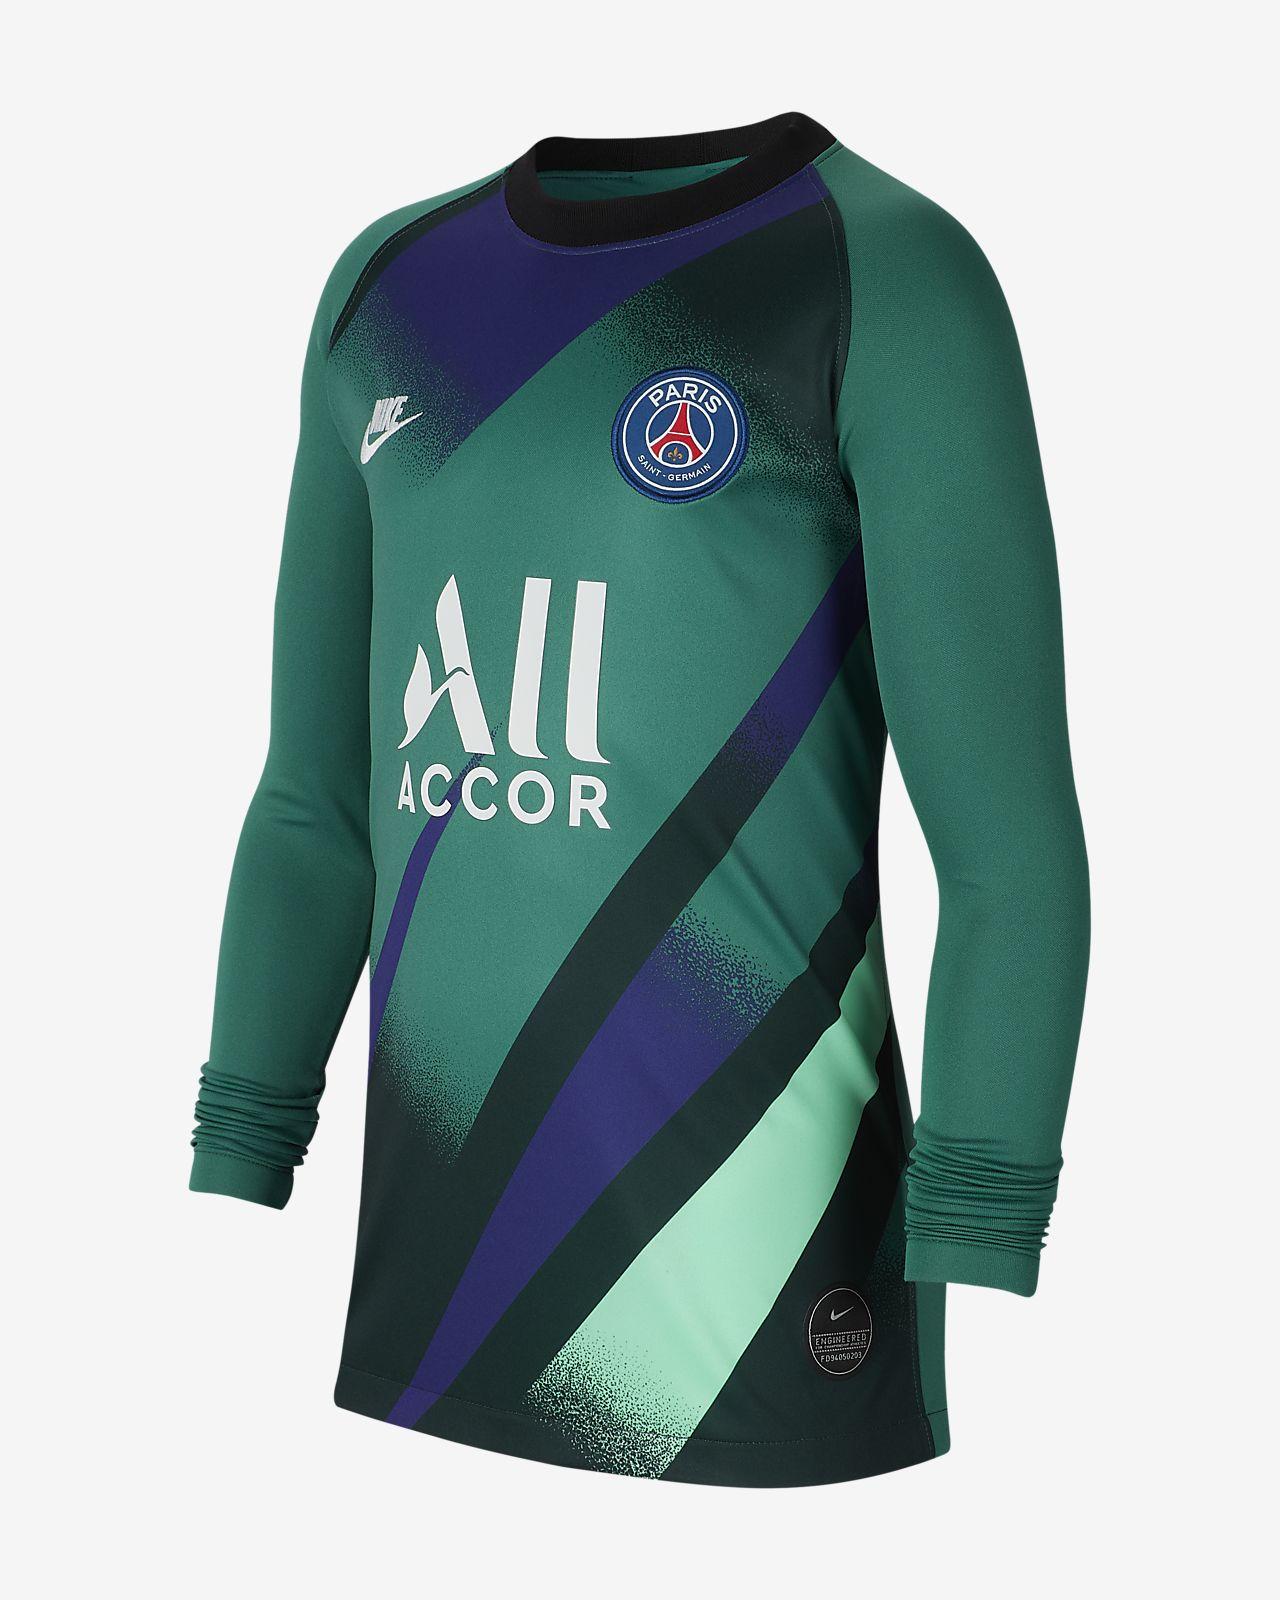 Fotbollströja Paris Saint-Germain 2019/20 Stadium Goalkeeper Third för ungdom